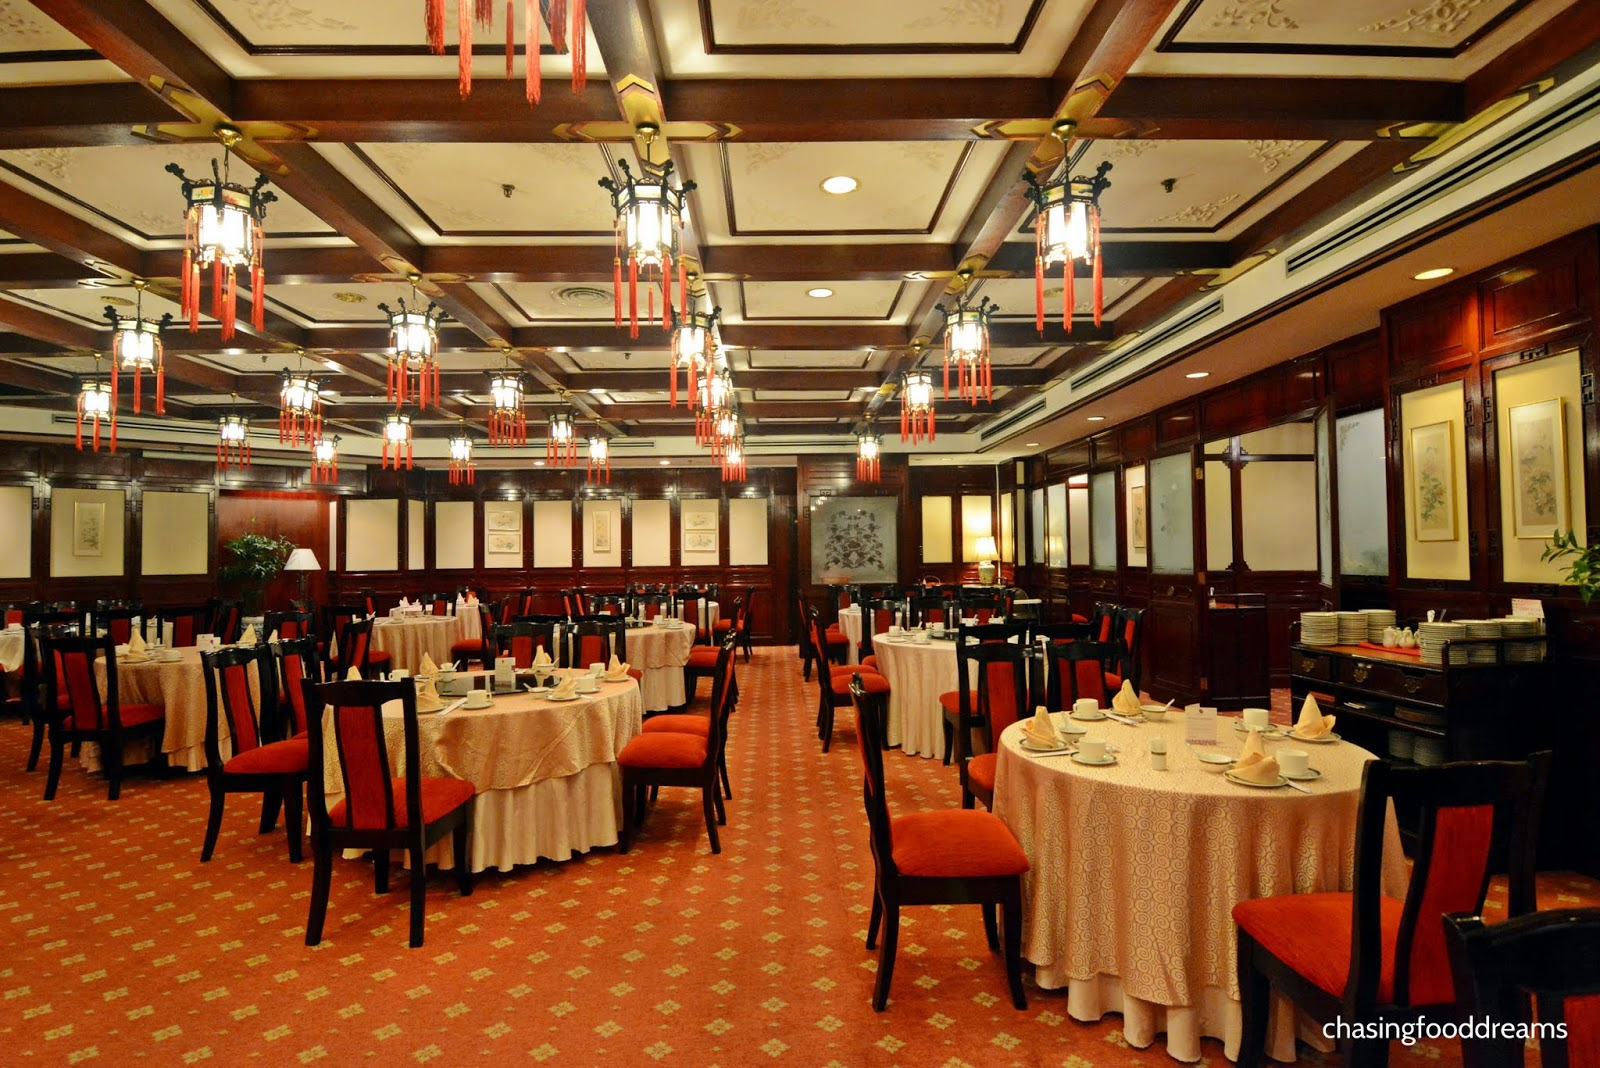 CHASING FOOD DREAMS Ming Palace Chinese Restaurant